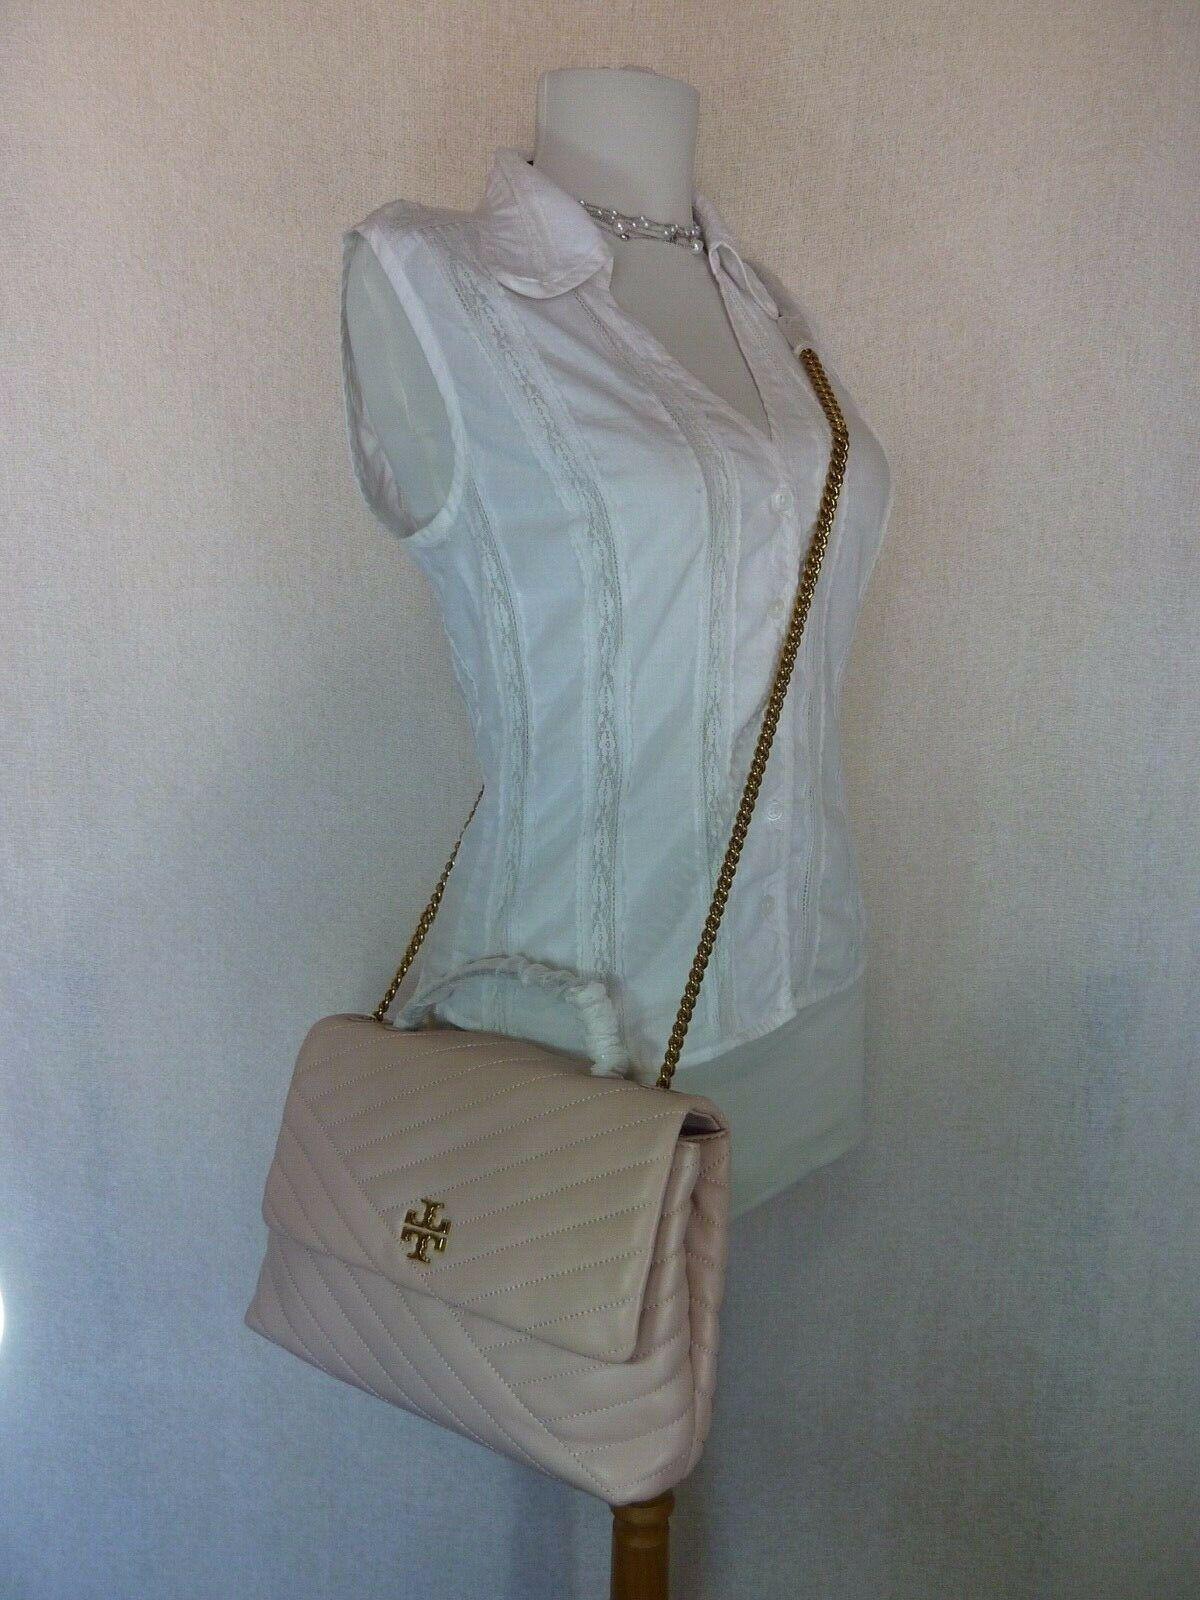 NWT Tory Burch Pink Moon Kira Chevron Convertible Shoulder Bag $528 image 3